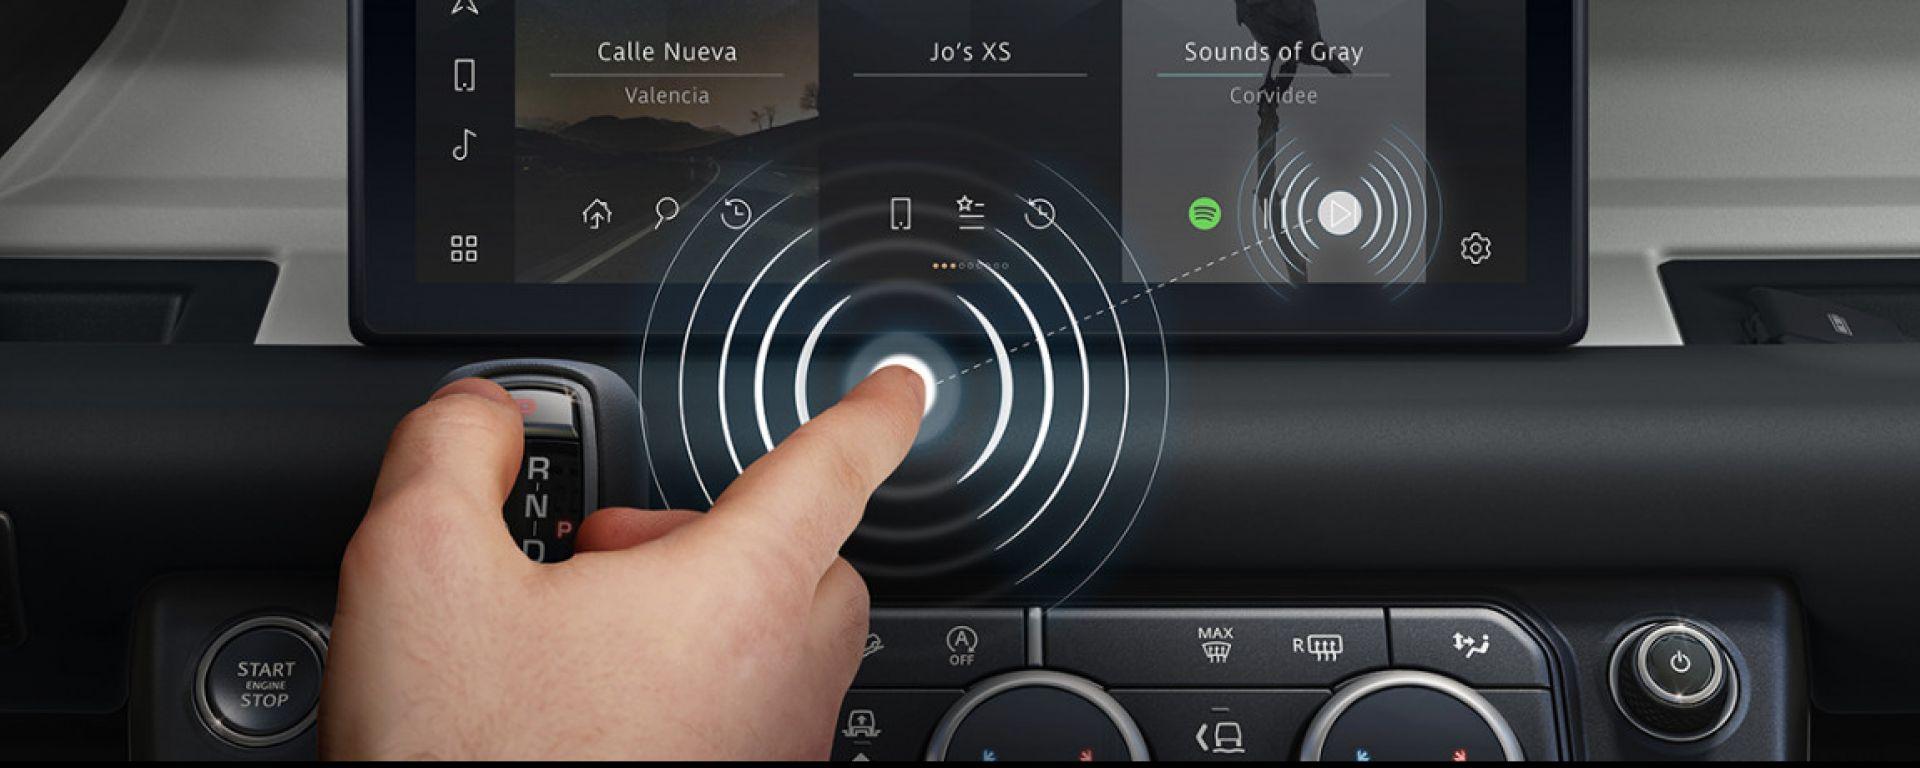 Jaguar Land Rover e il touchscreen contactless anti Covid